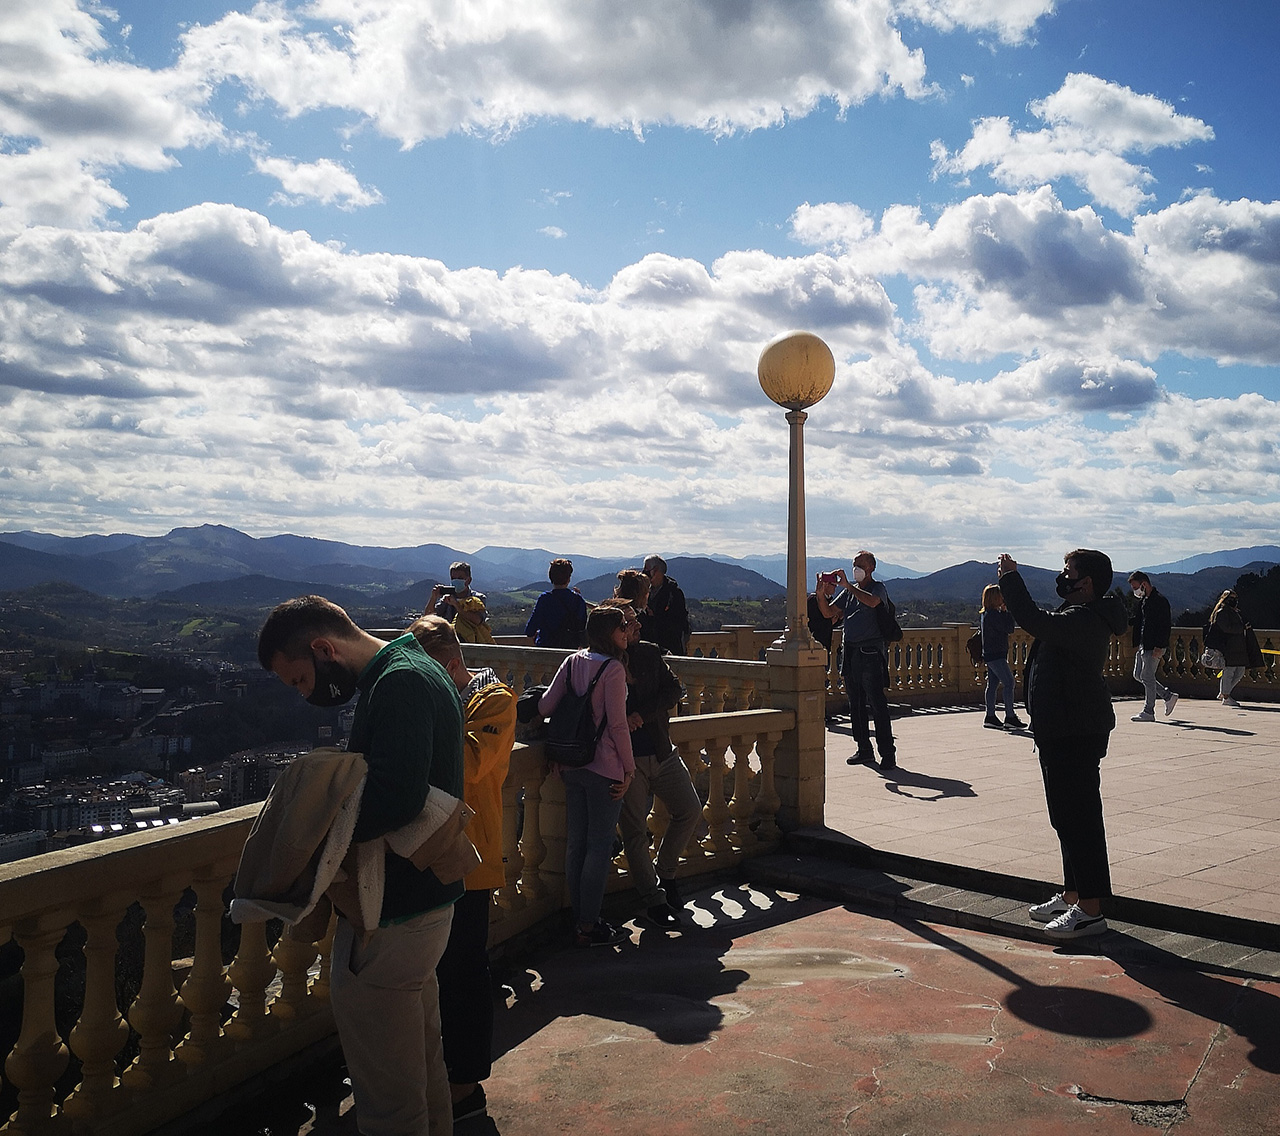 turistas igueldo - El Monte Igueldo resiste